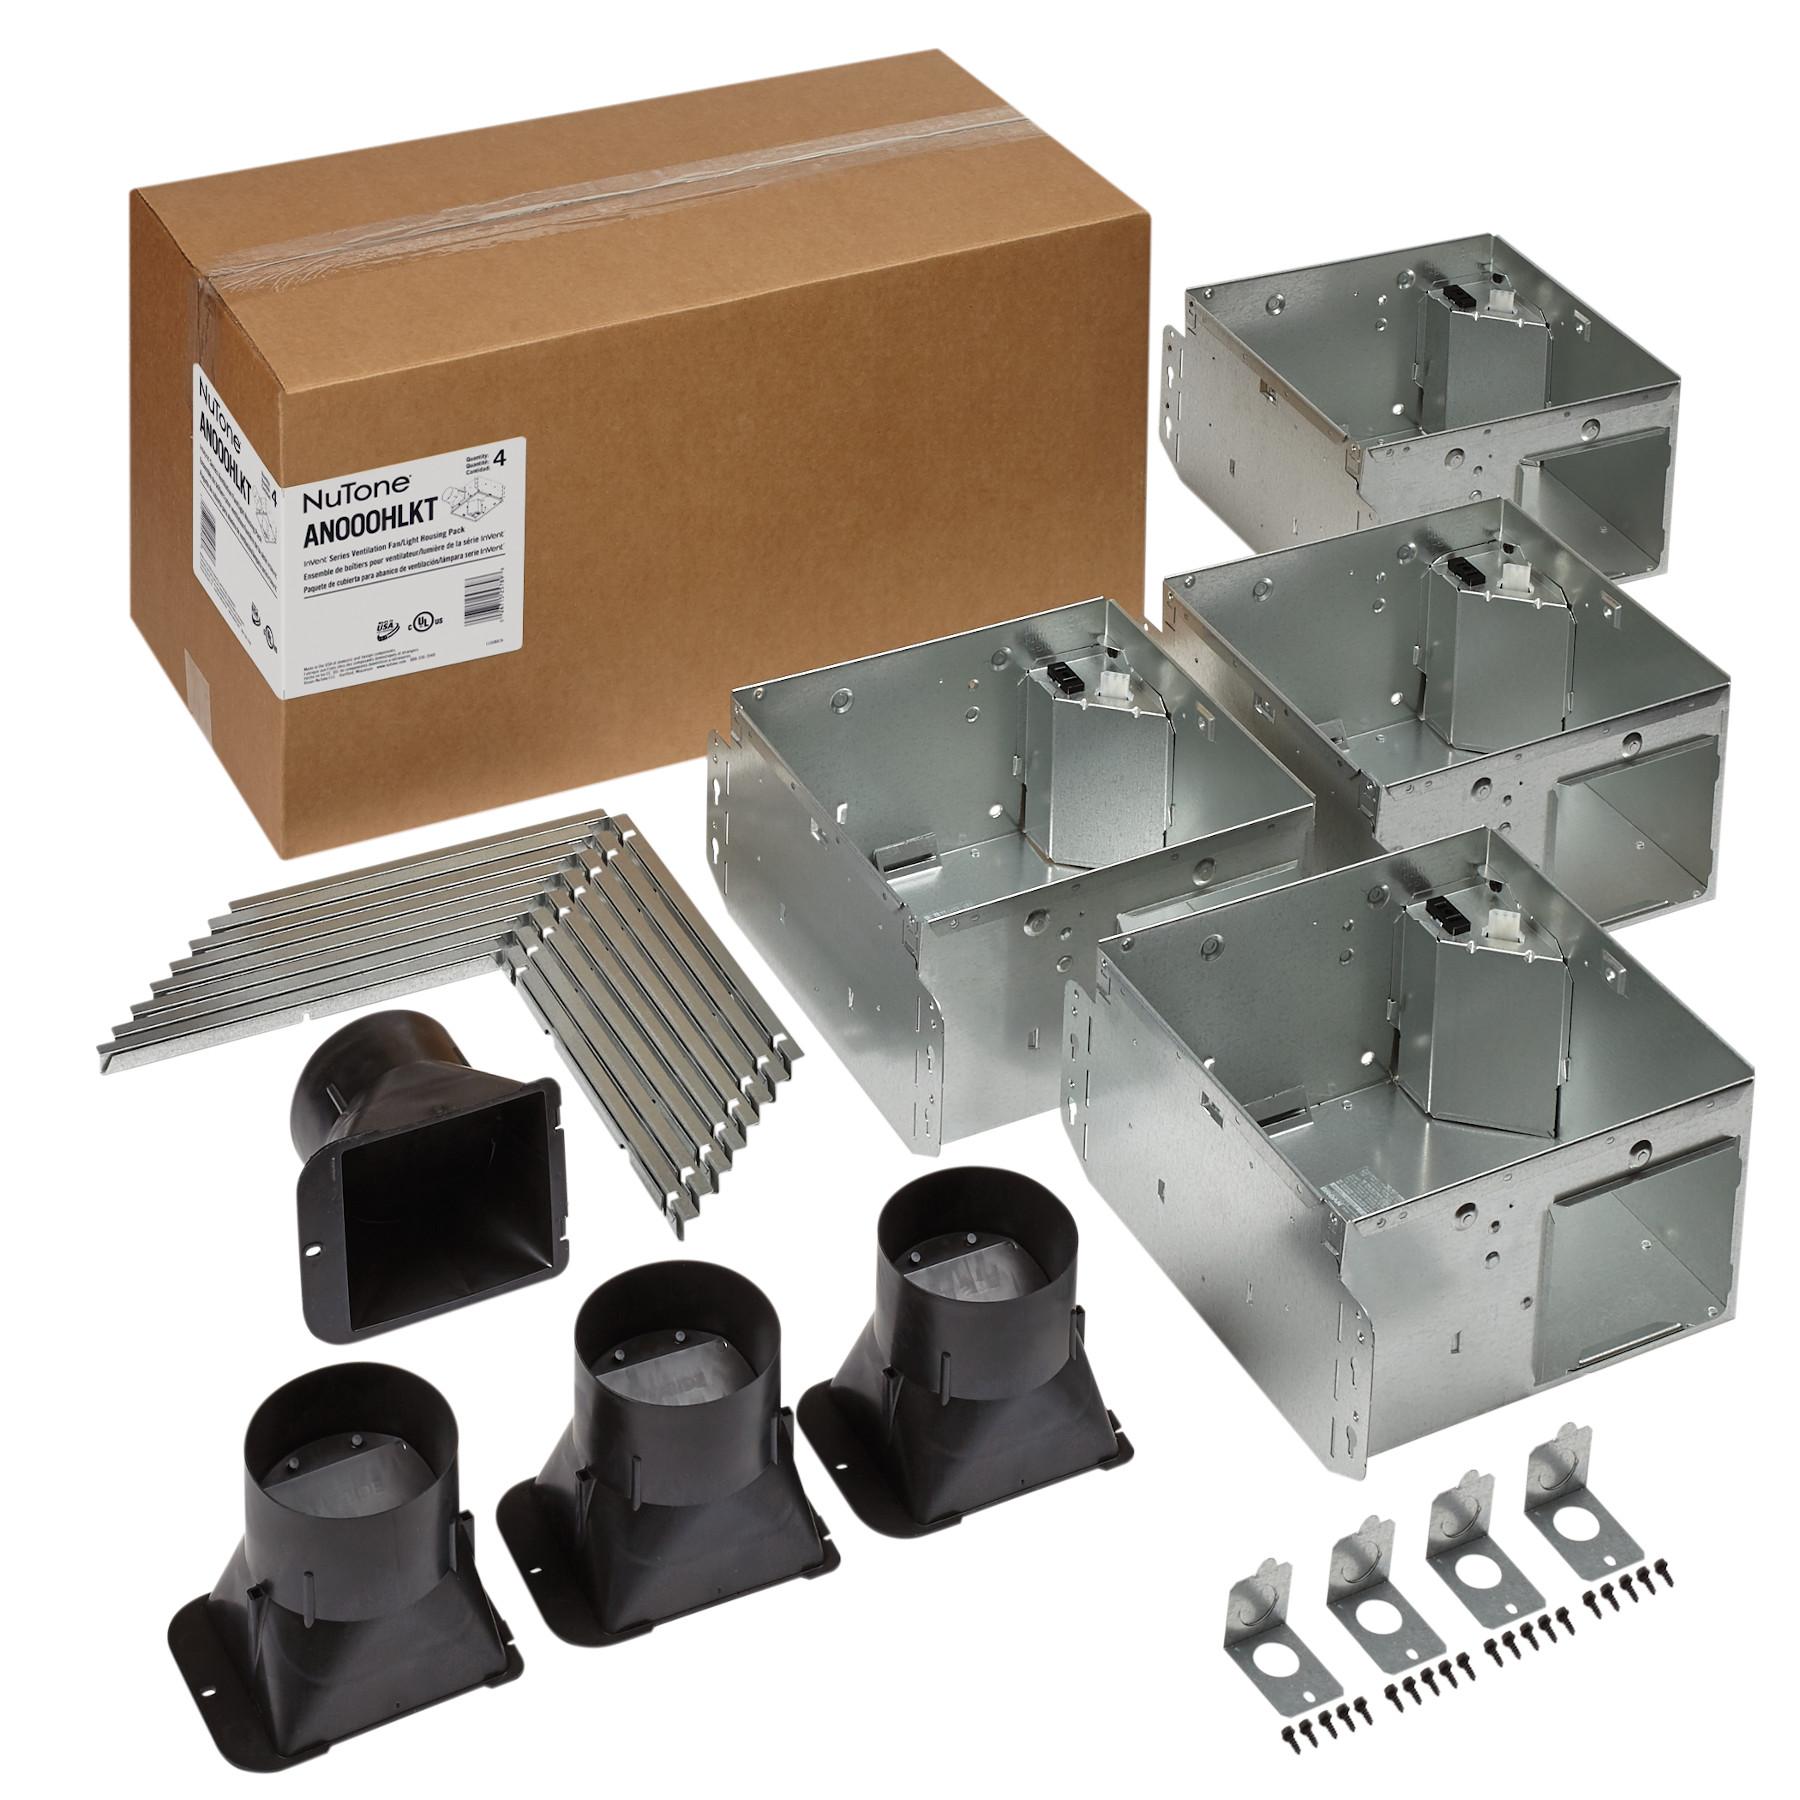 NuTone® Flex Series Ventilation Fan Light Housing Pack with Flange Kit